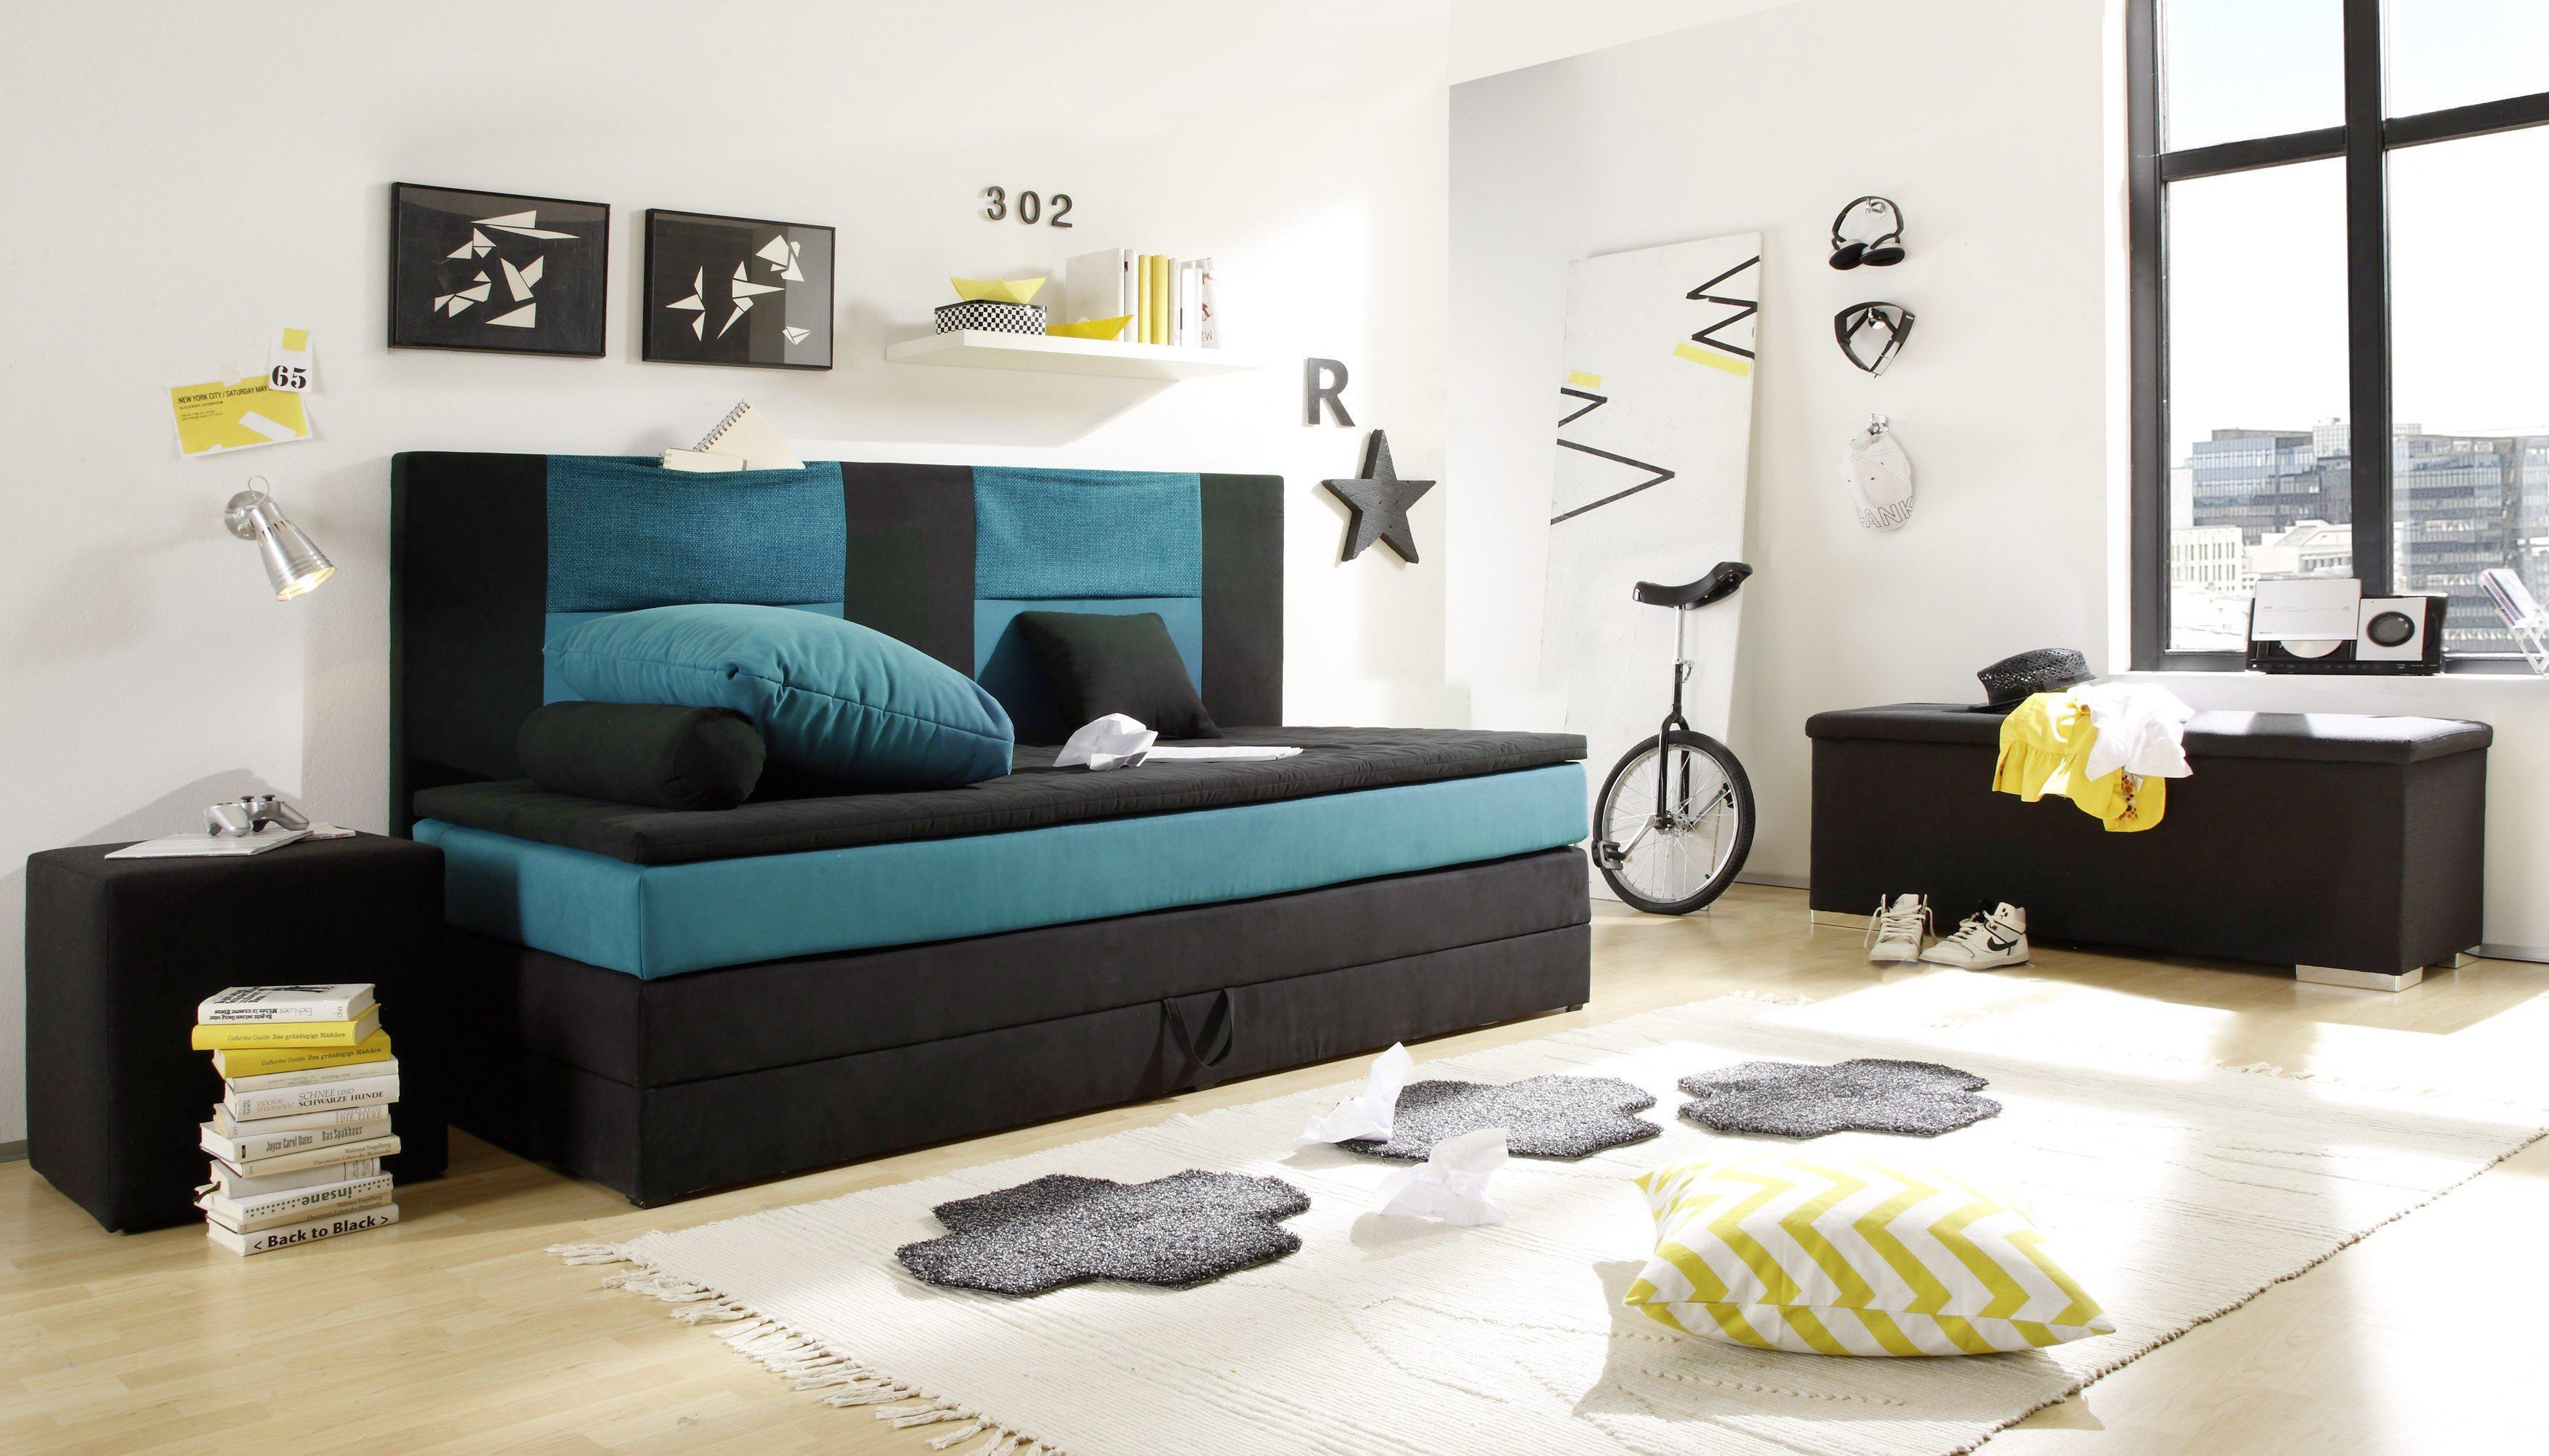 boxspringbett kid stripe black red white in schwarz petrol 90 x 200 cm m bel letz ihr online shop. Black Bedroom Furniture Sets. Home Design Ideas